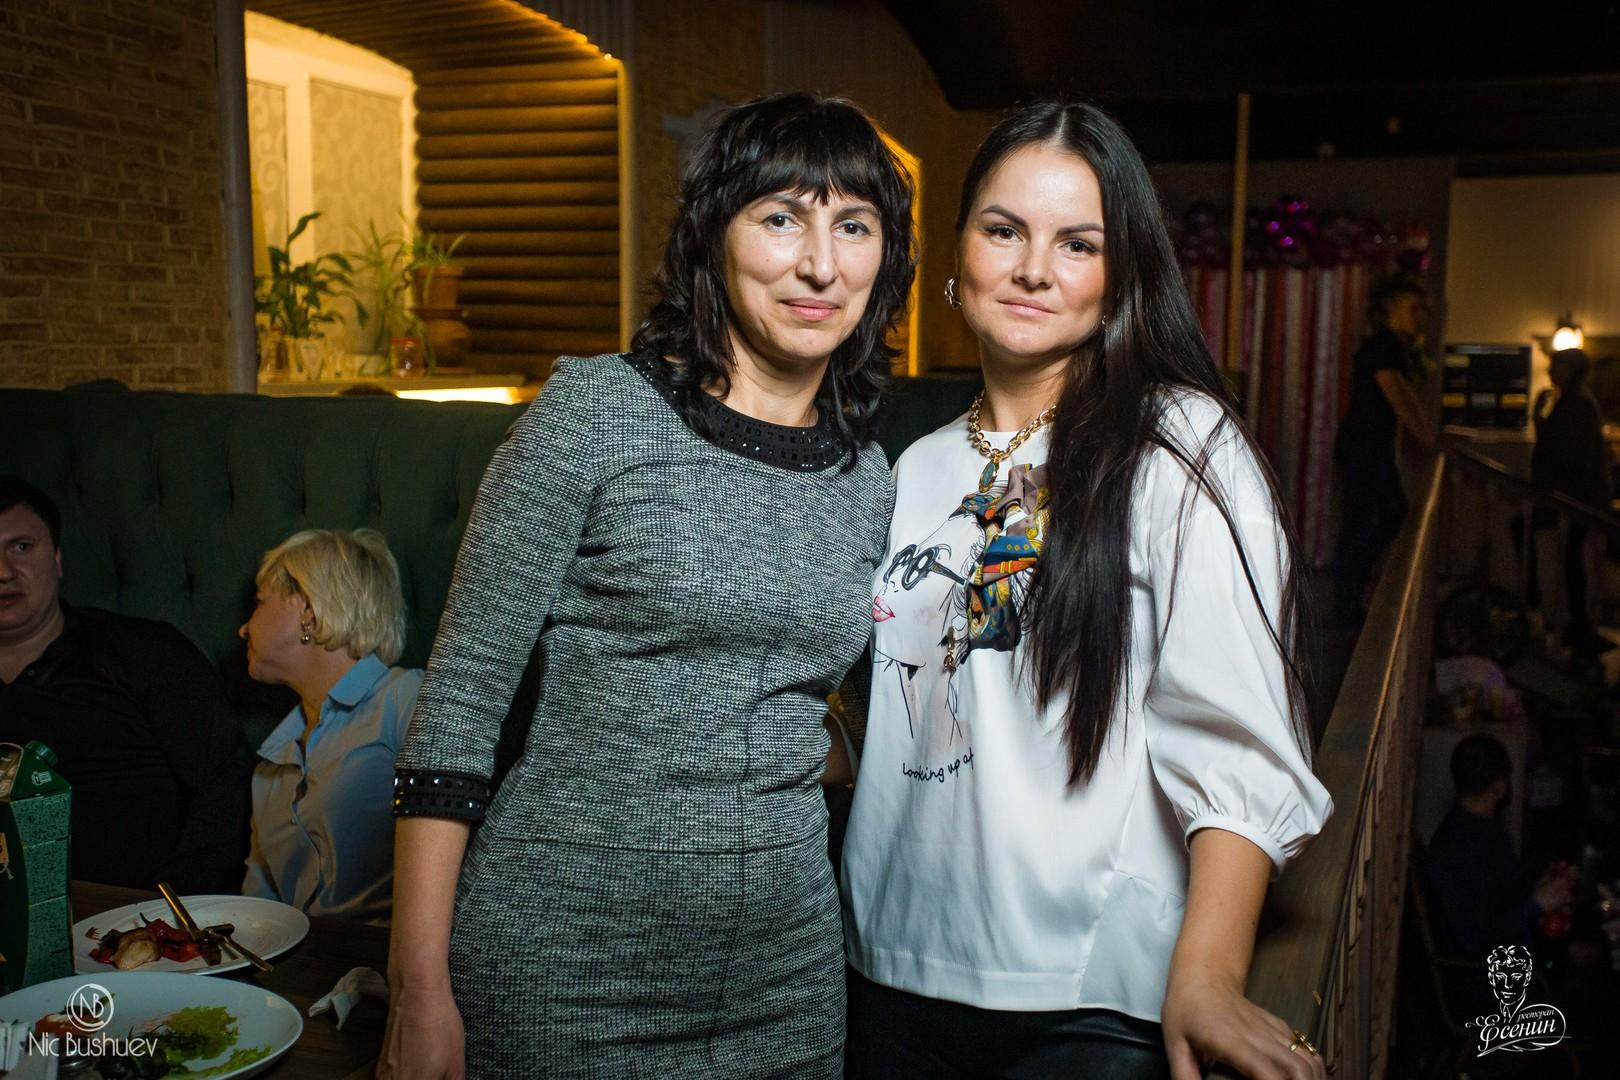 Ресторан Орехово-Зуево Есенин 07_03_2020 (63)